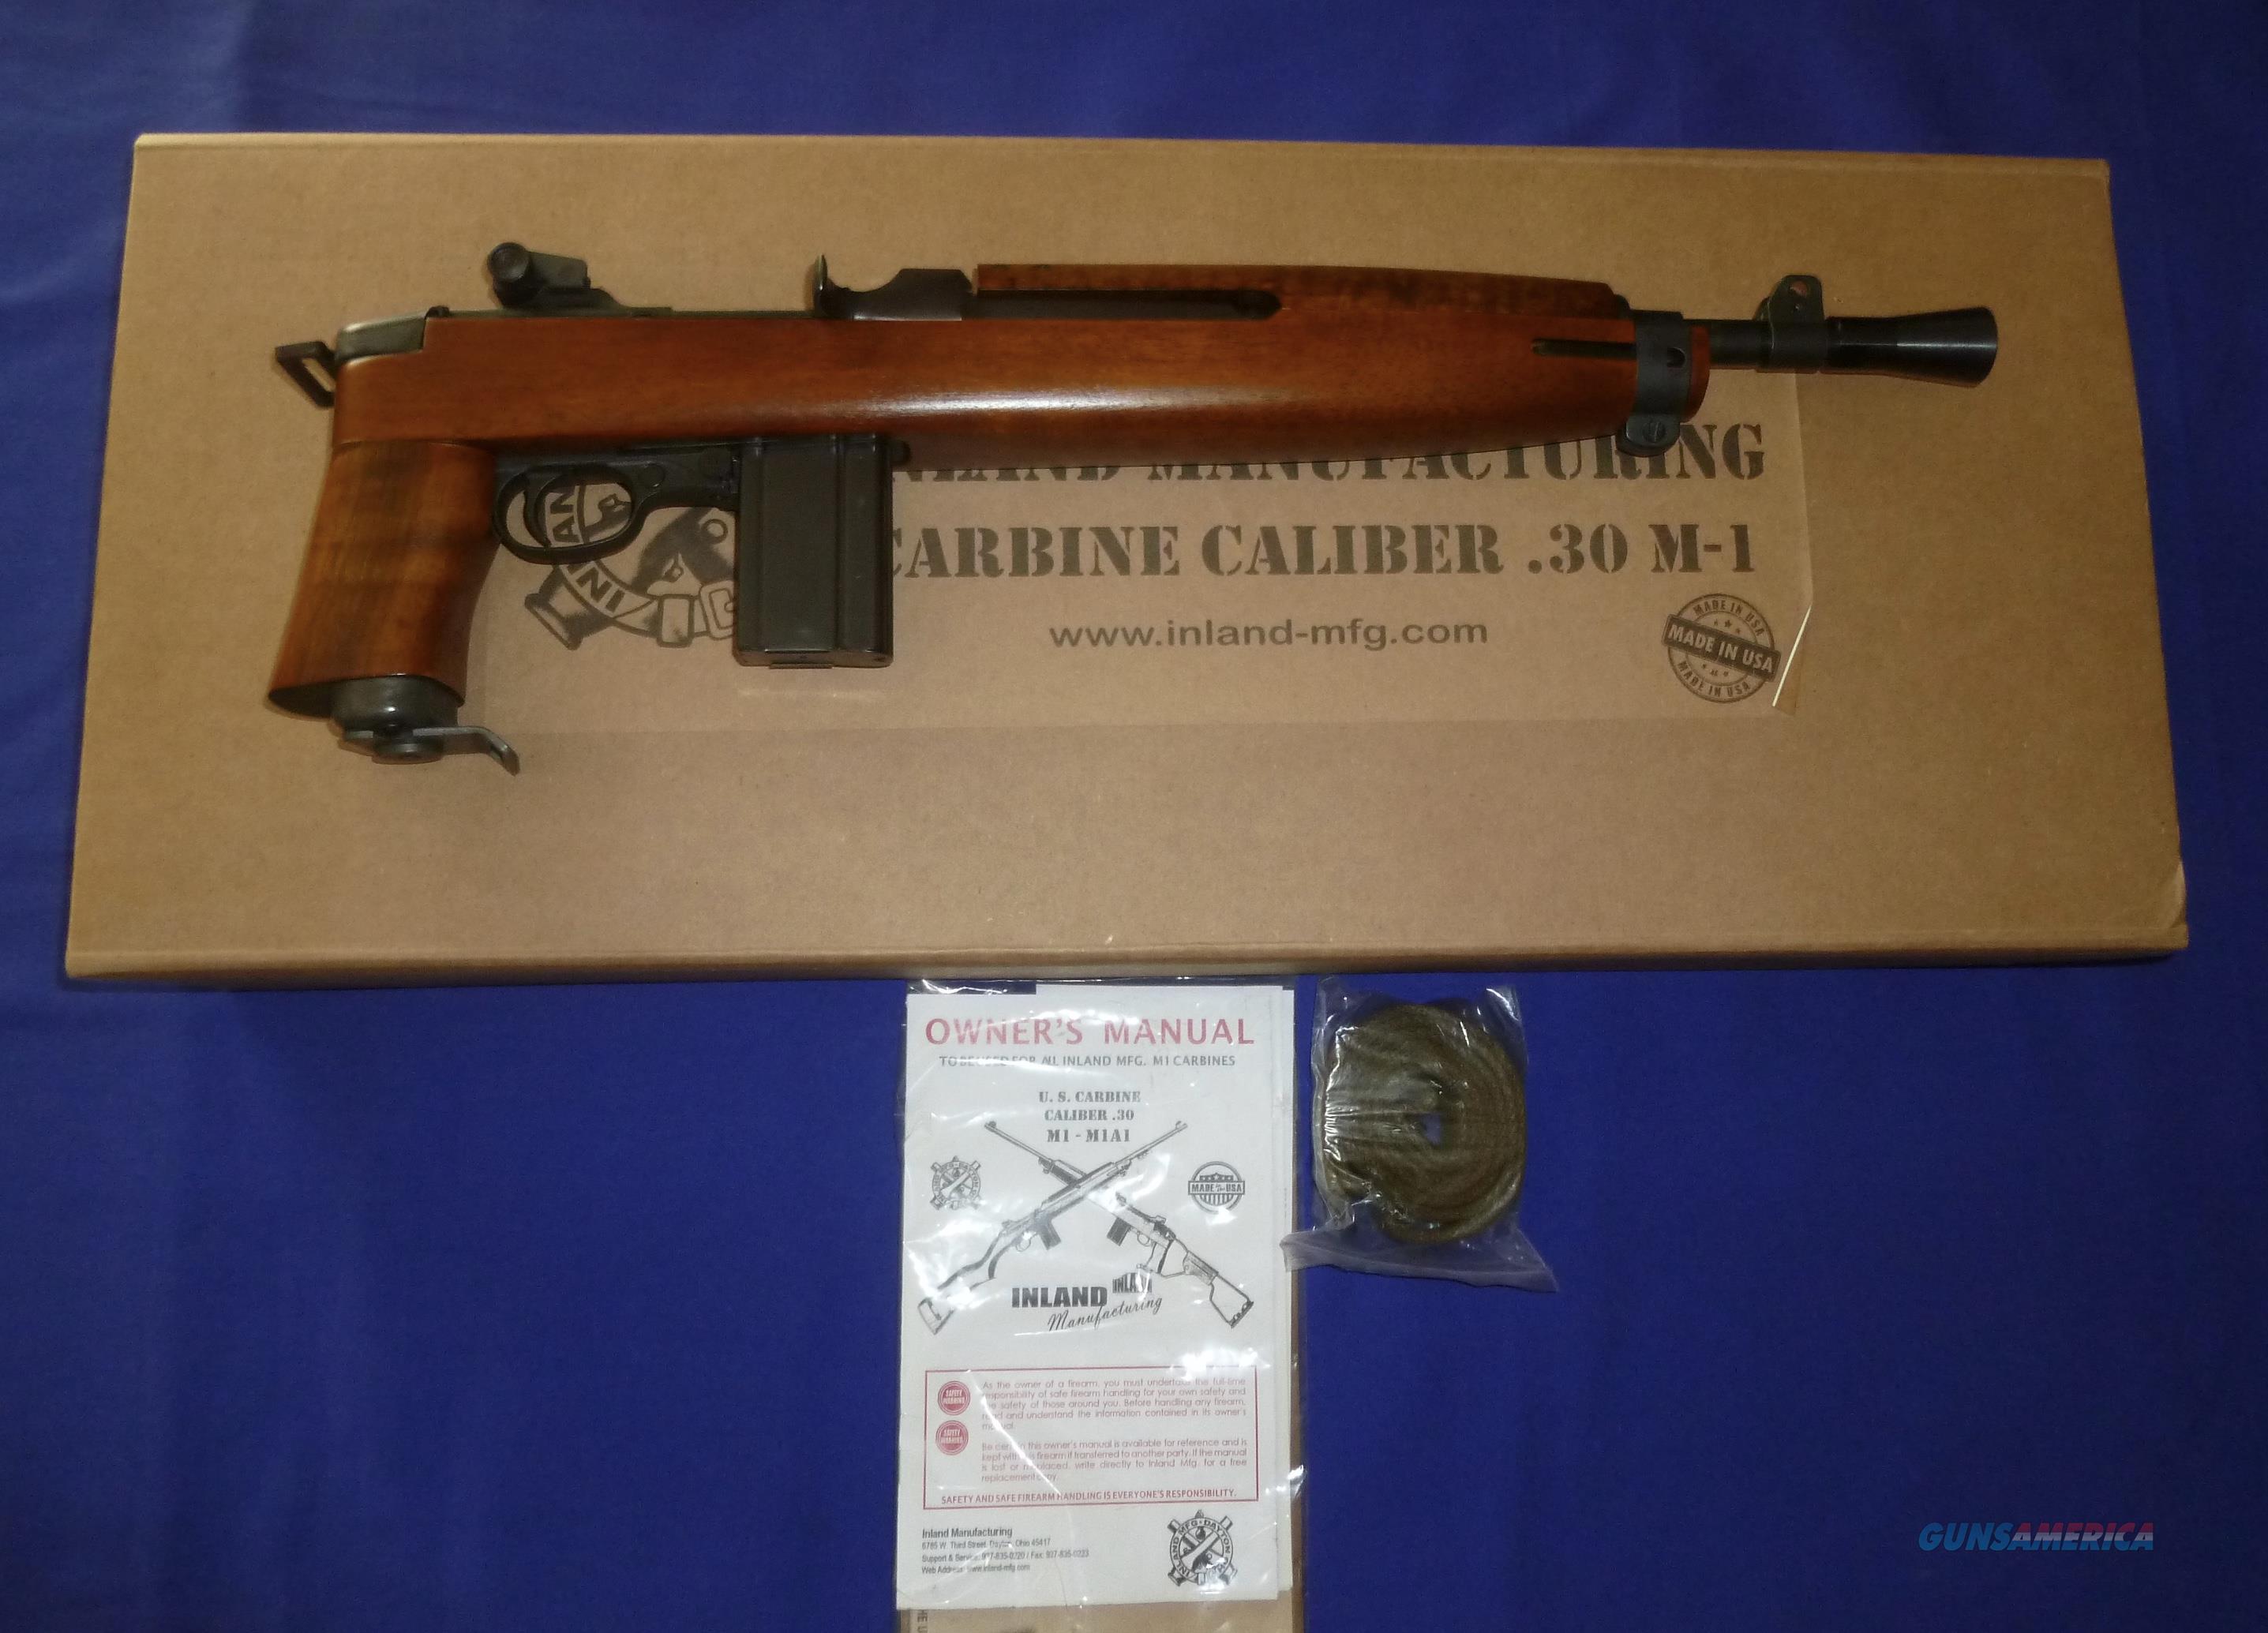 SALE PRICED! INLAND MFG M1 CARBINE PISTOL (THE ADVISOR)  30 CARBINE CALIBER